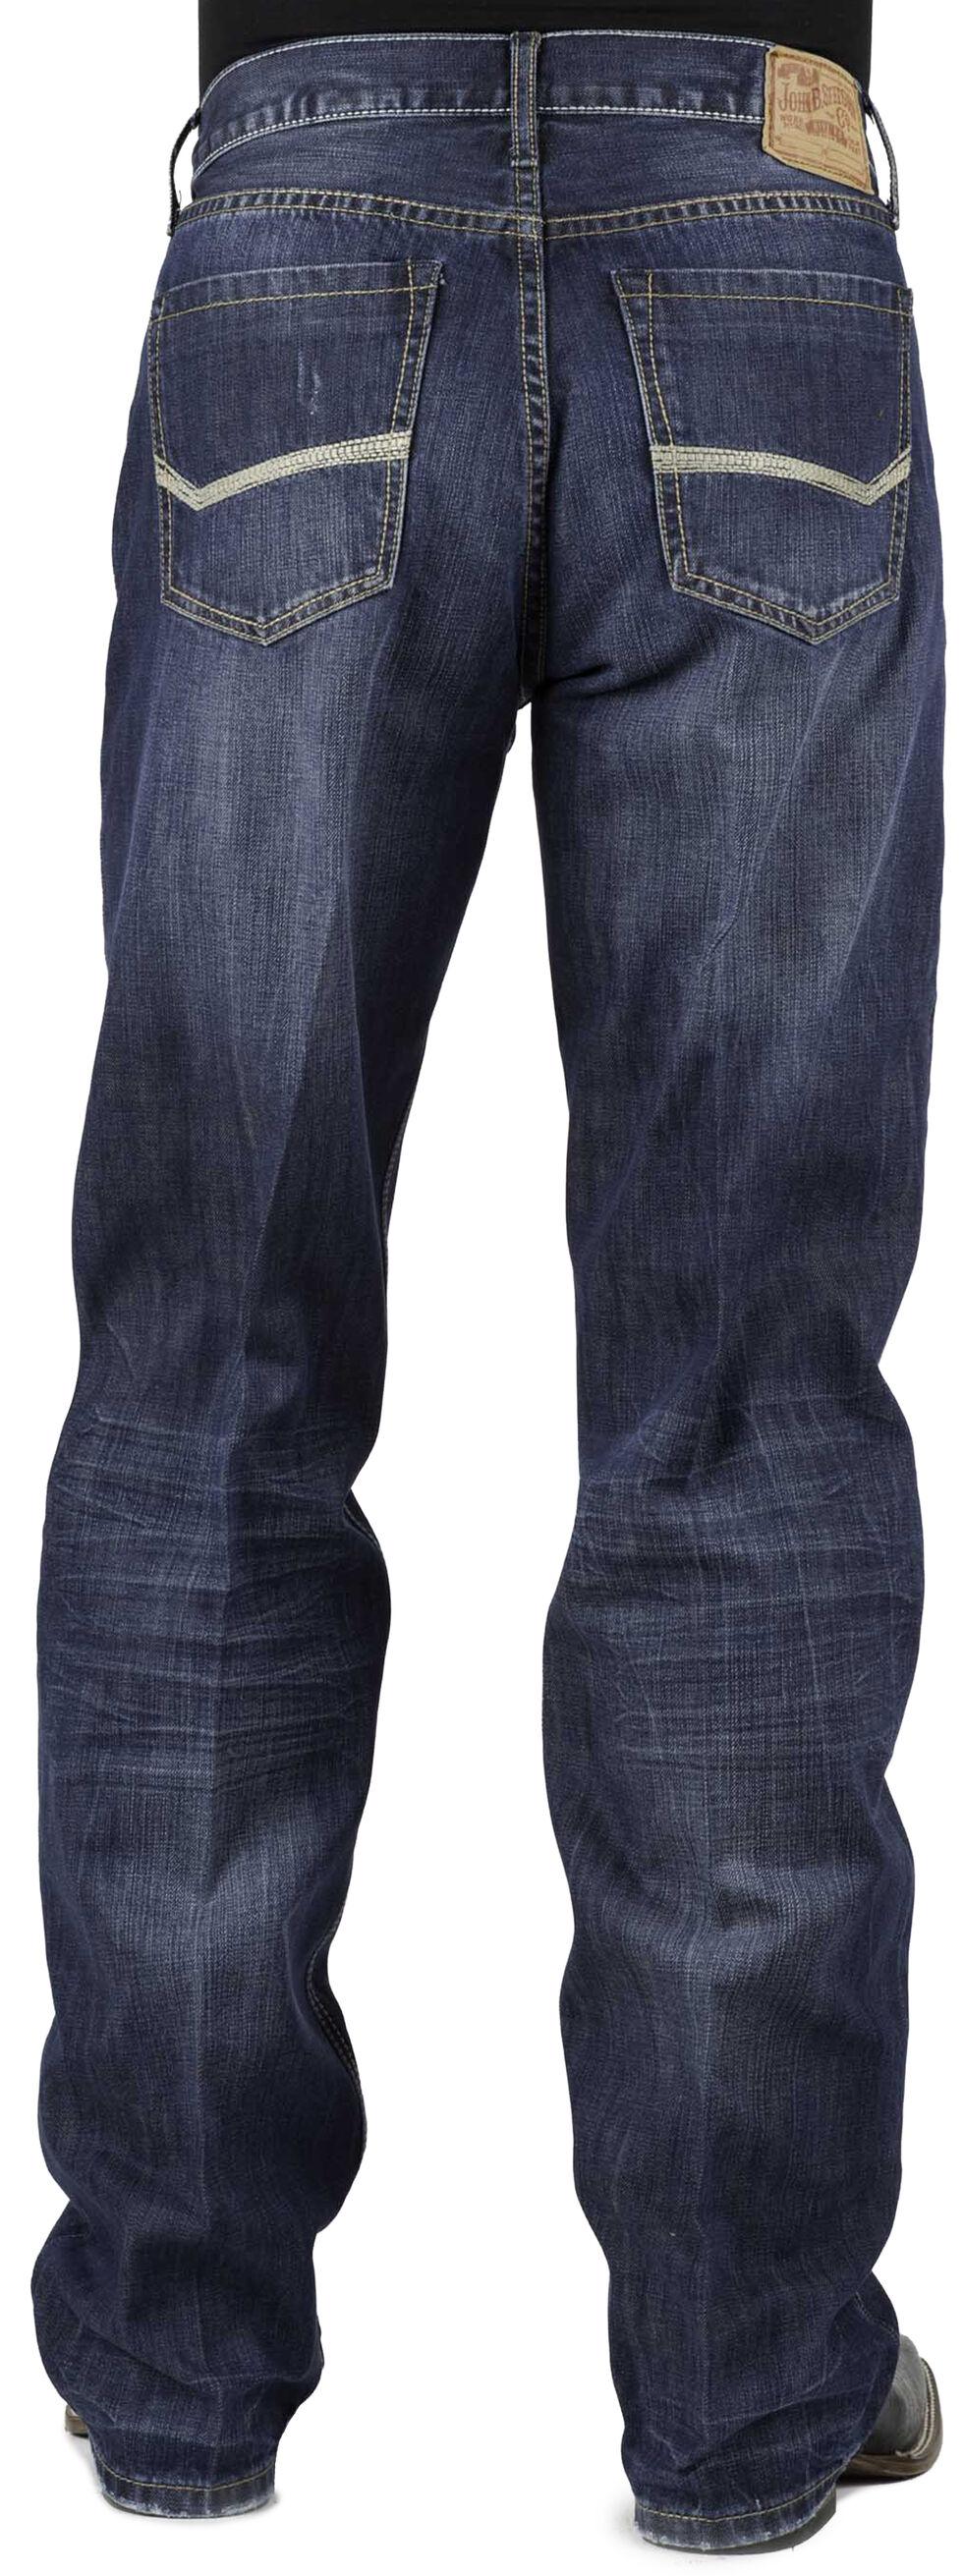 Stetson Modern Fit Bold Stitched Jeans, Denim, hi-res